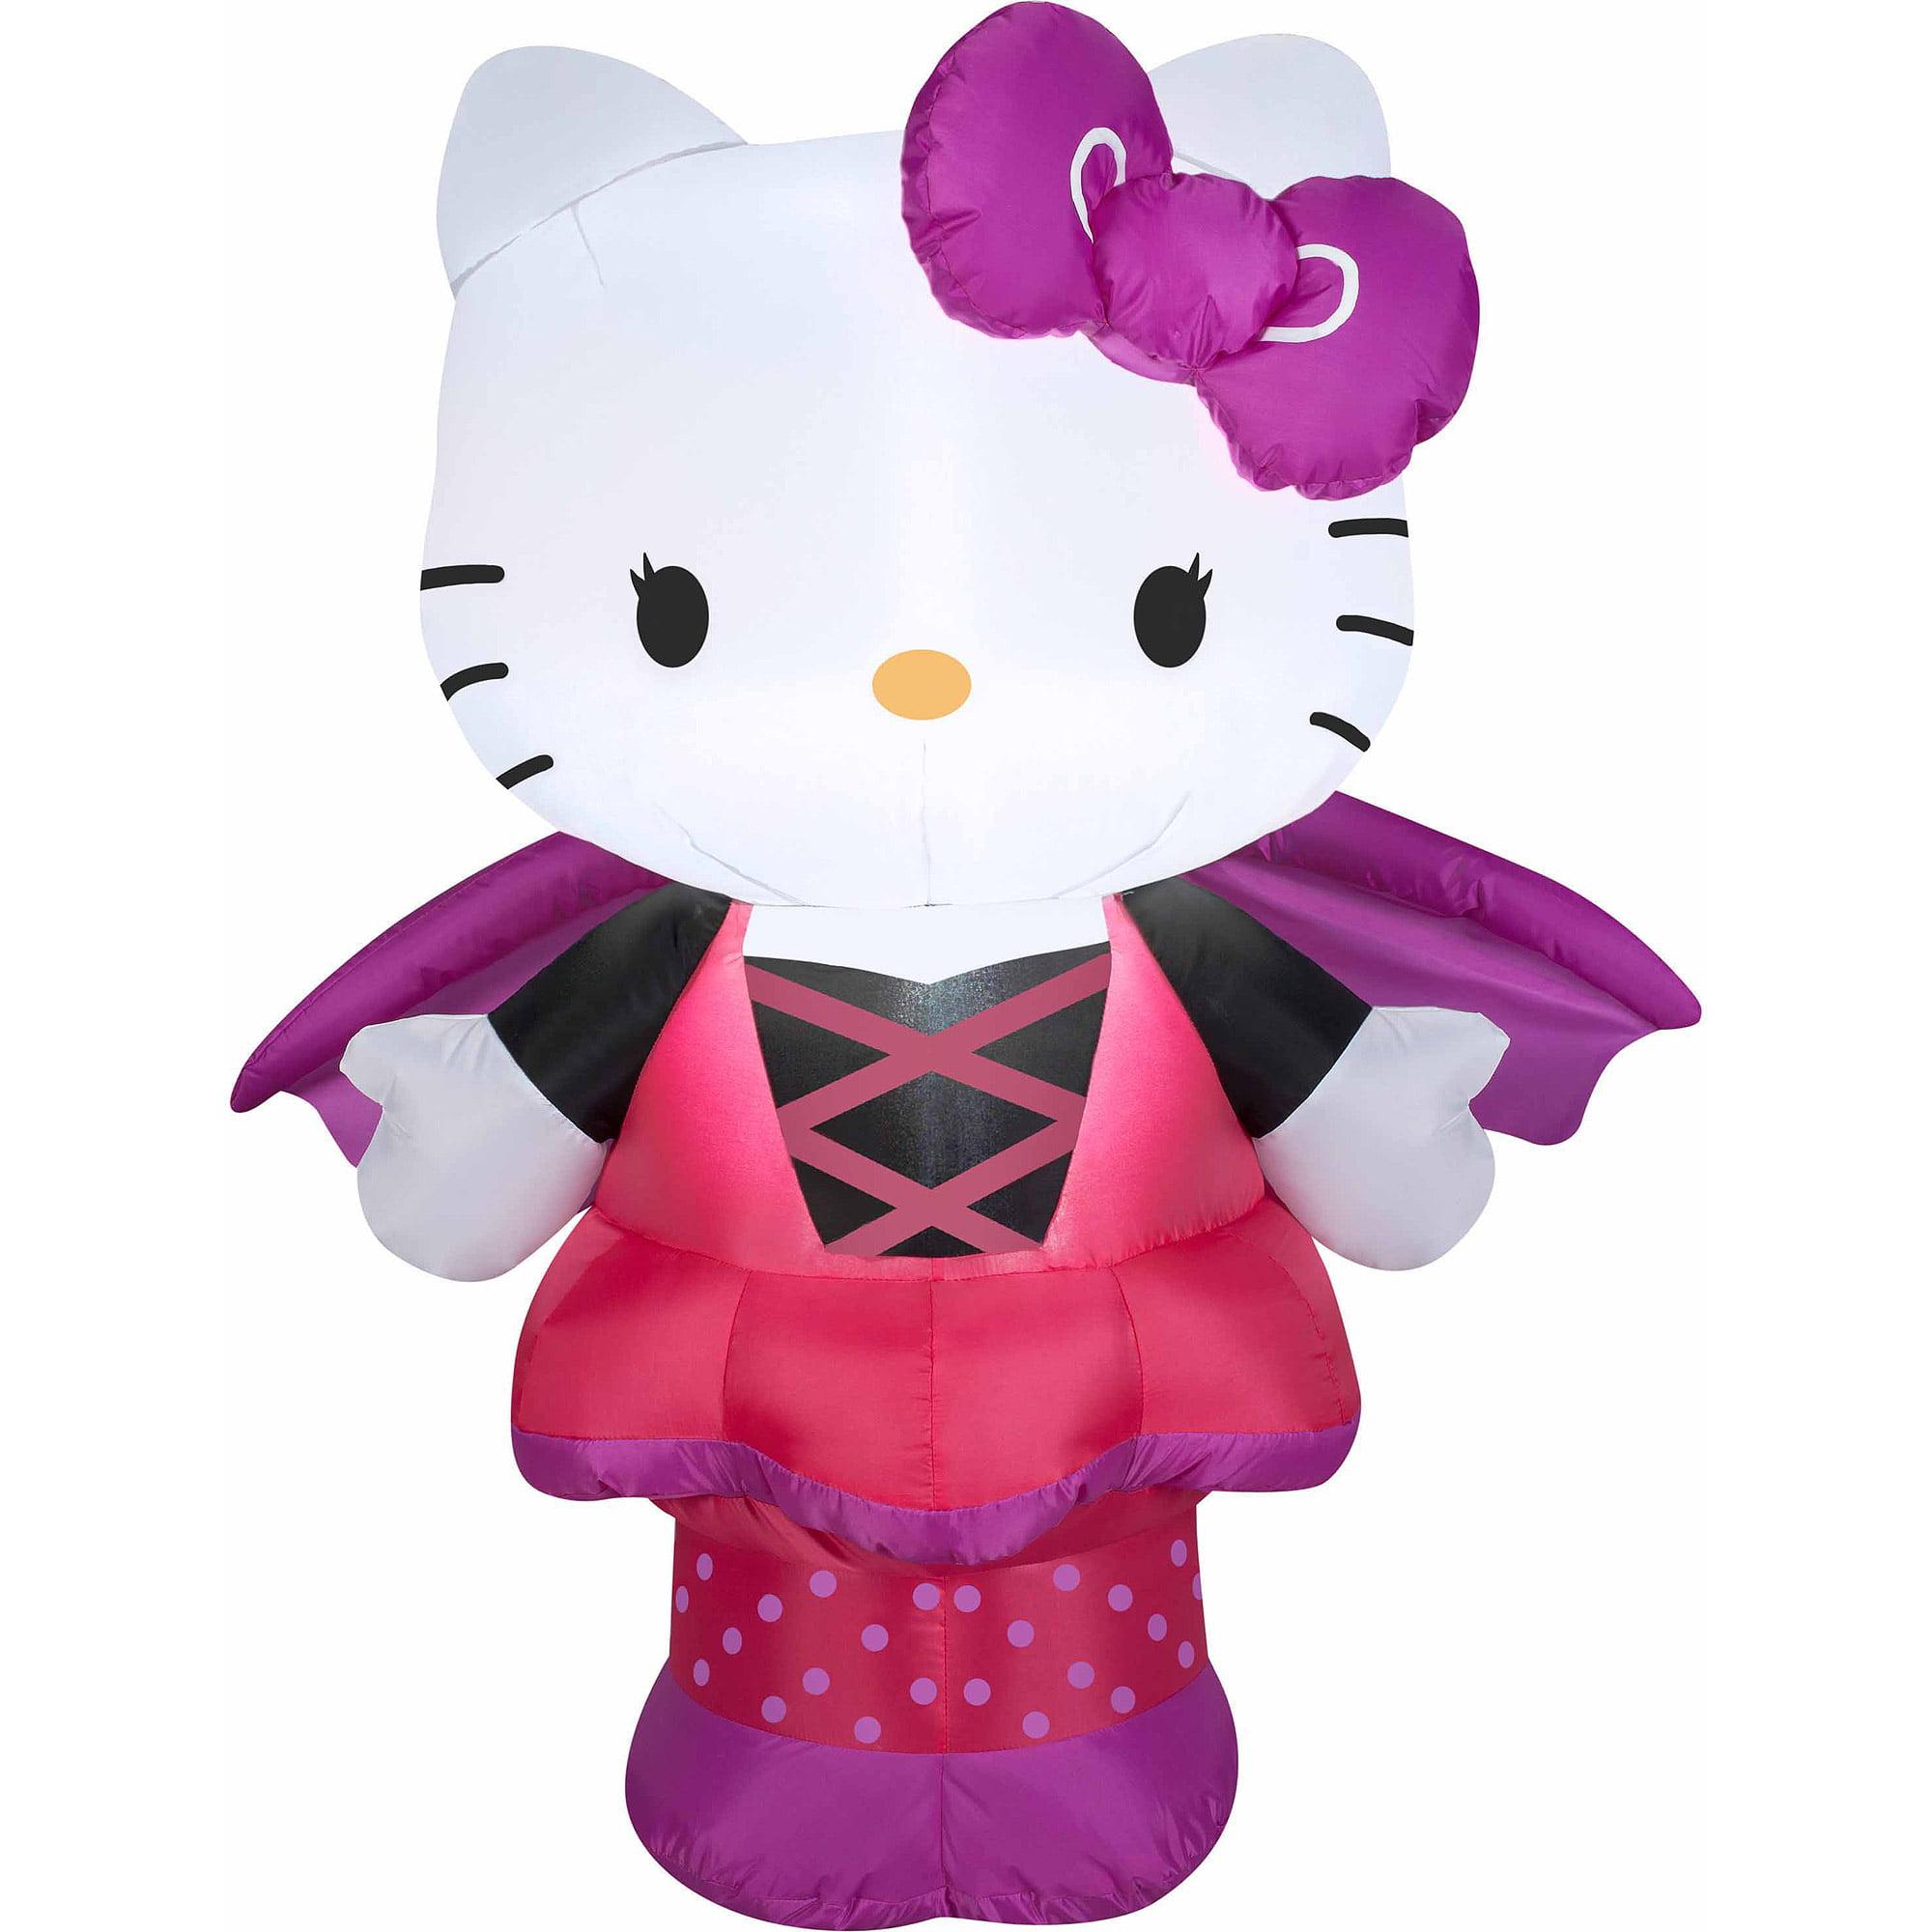 3' Airblown Inflatables Sanrio Hello Kitty as Bat Halloween Decoration